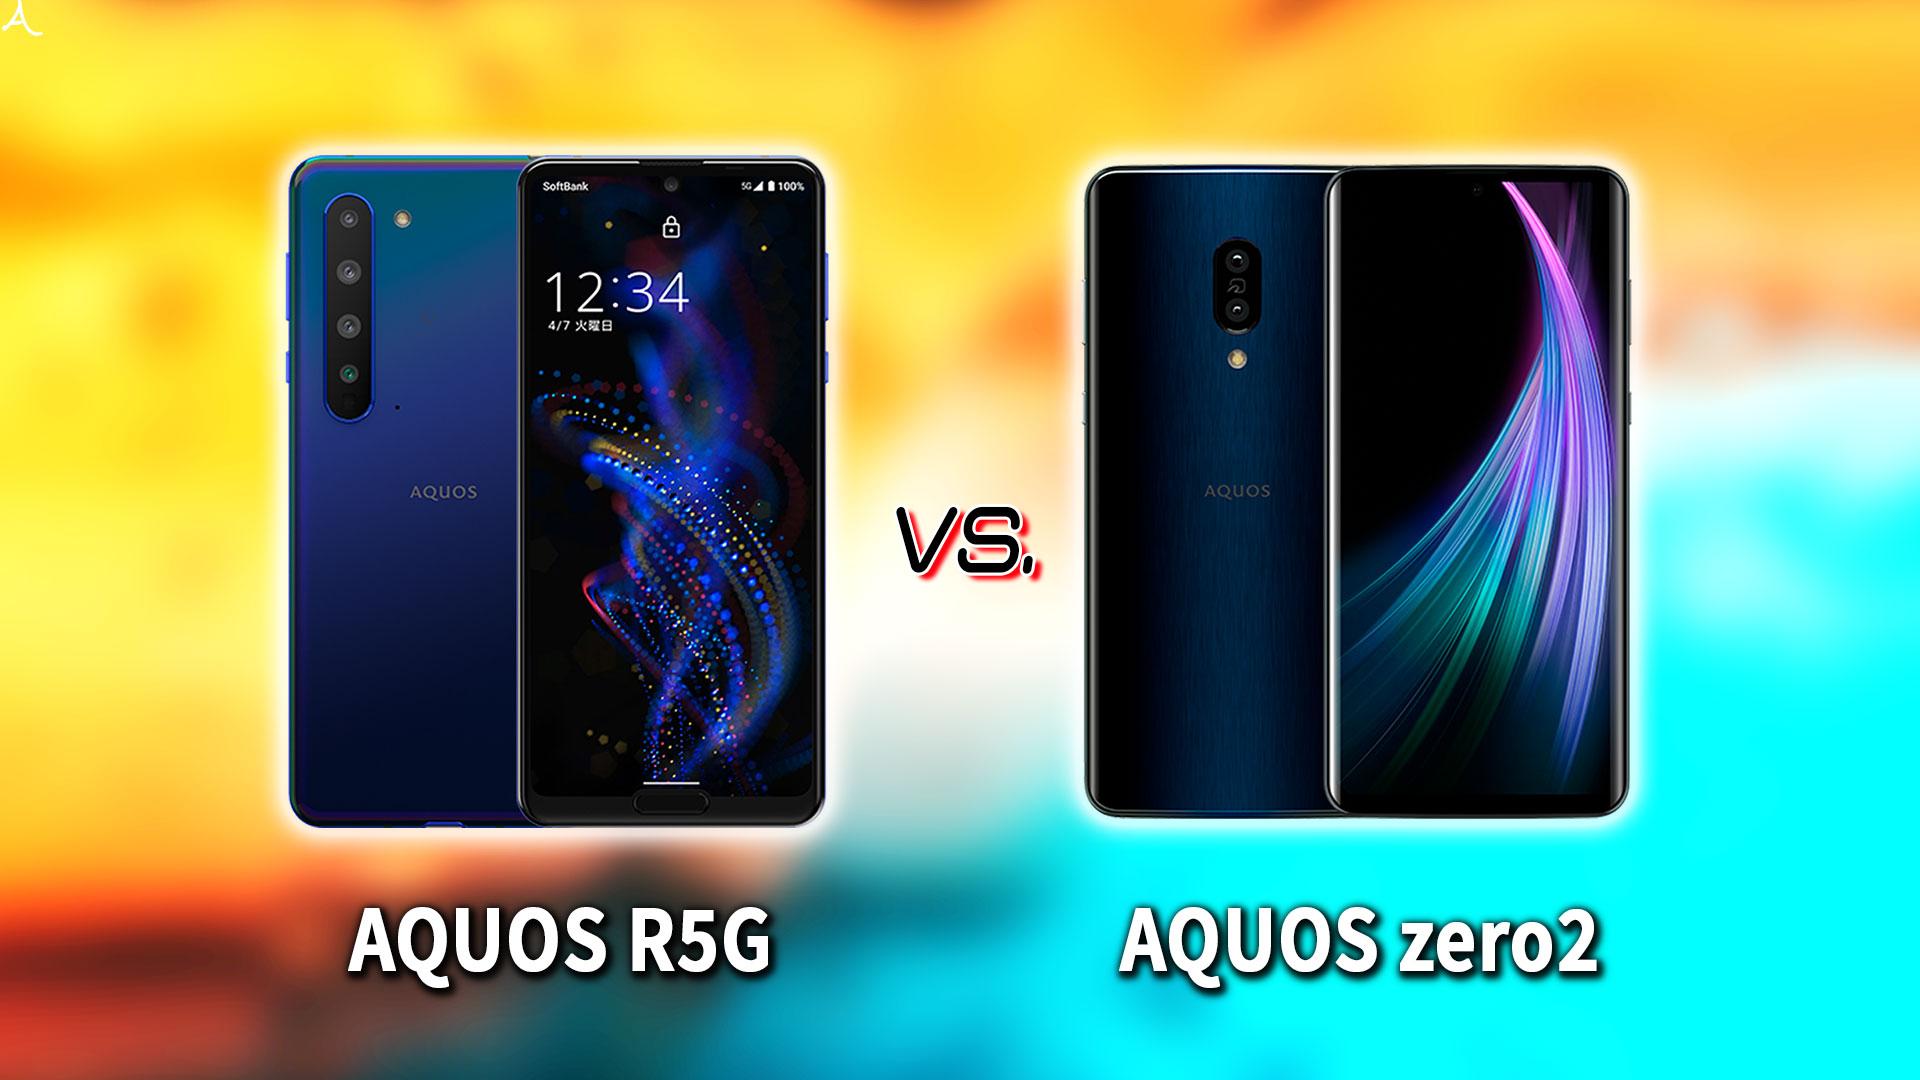 「AQUOS R5G」と「AQUOS zero2」の違いを比較:どっちを買う?